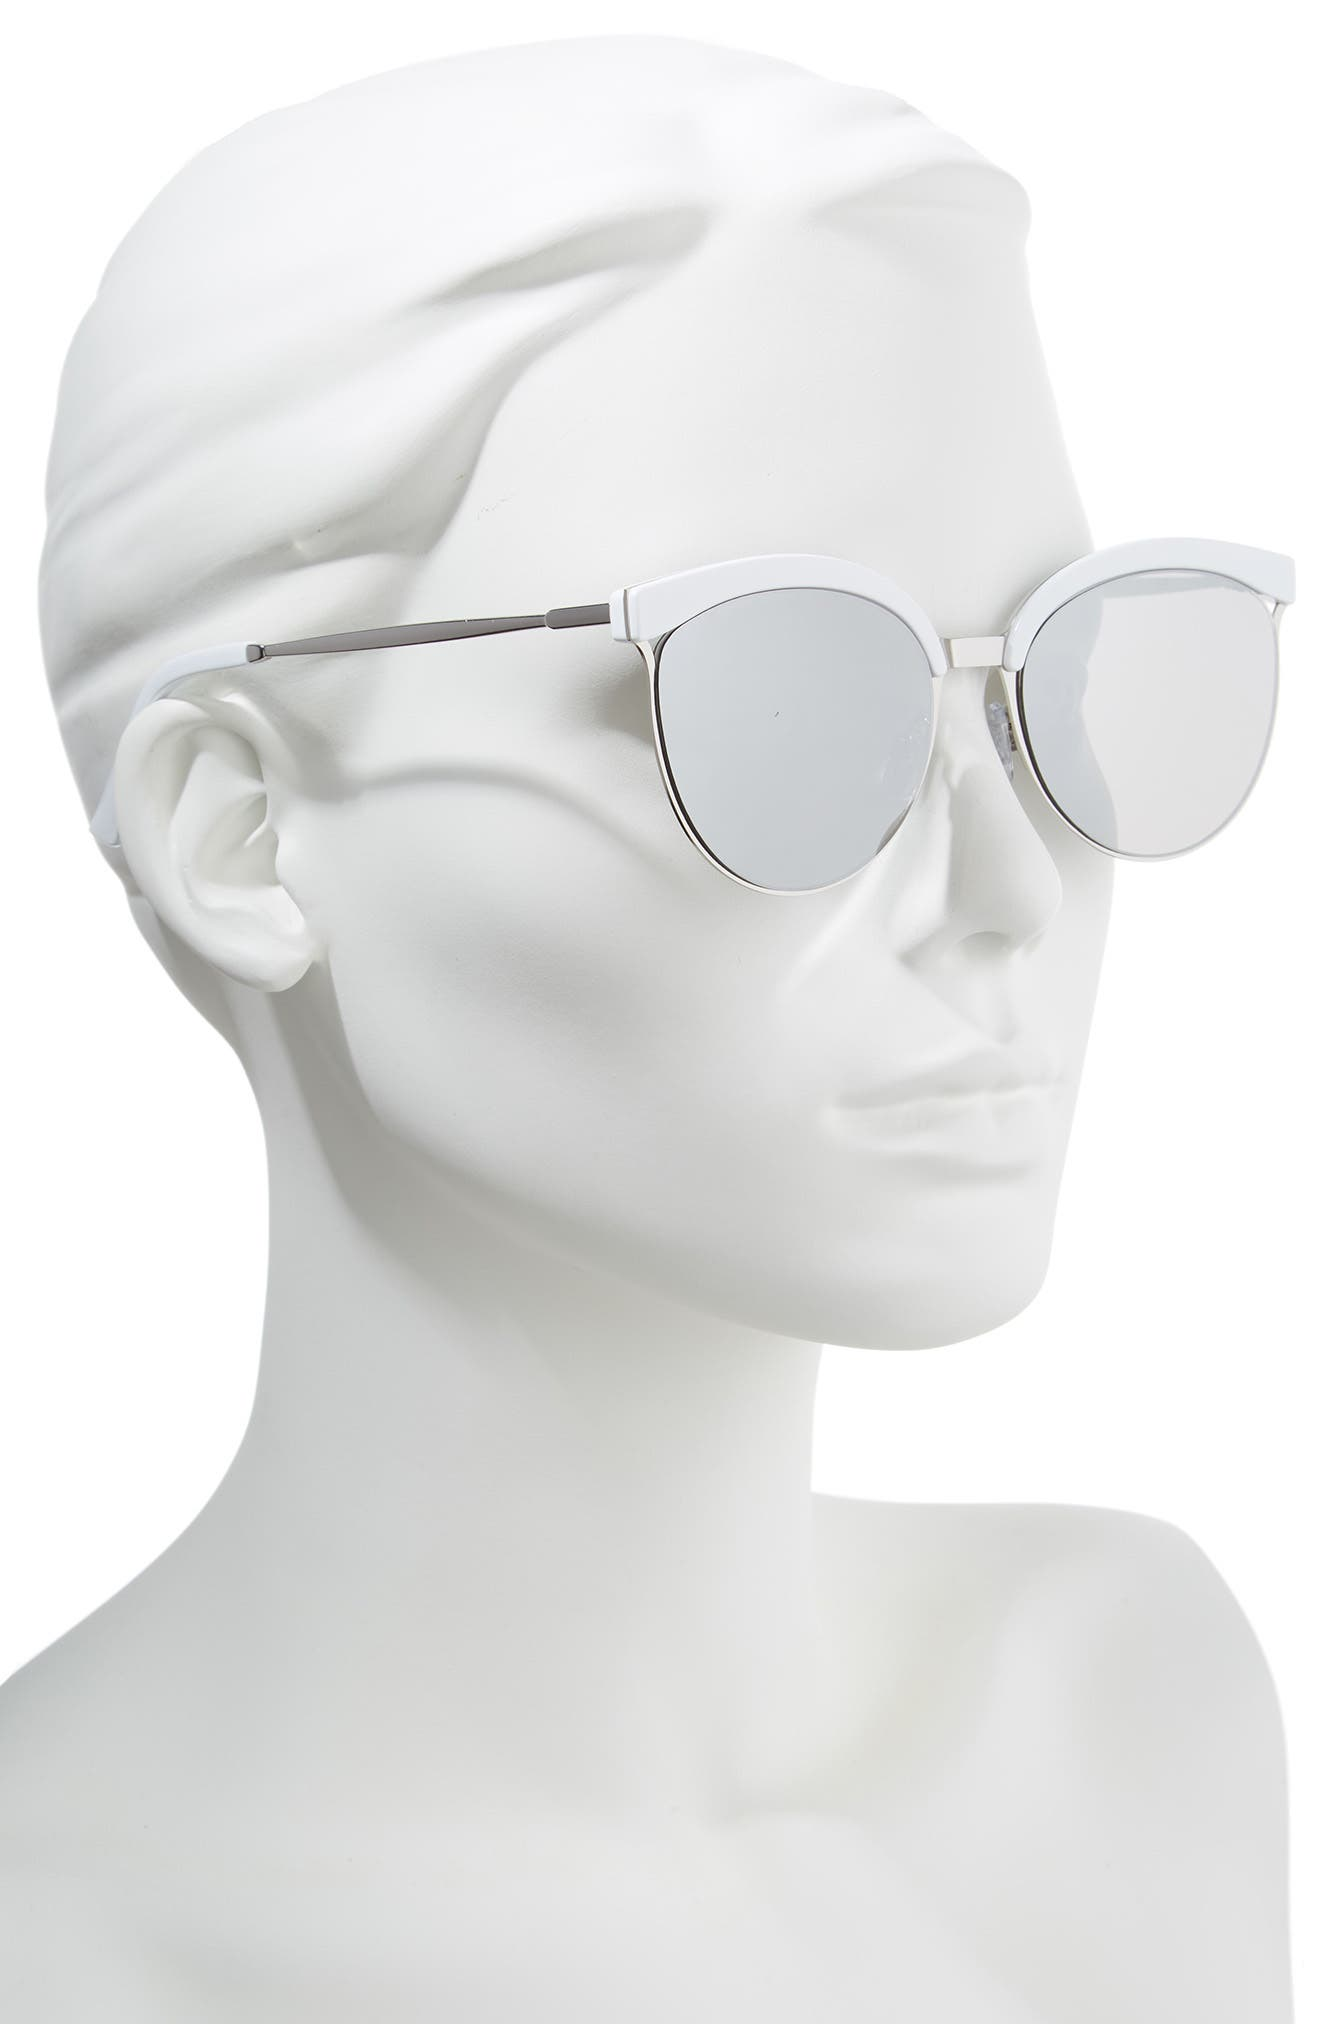 57mm Round Sunglasses,                             Alternate thumbnail 2, color,                             WHITE/ SILVER